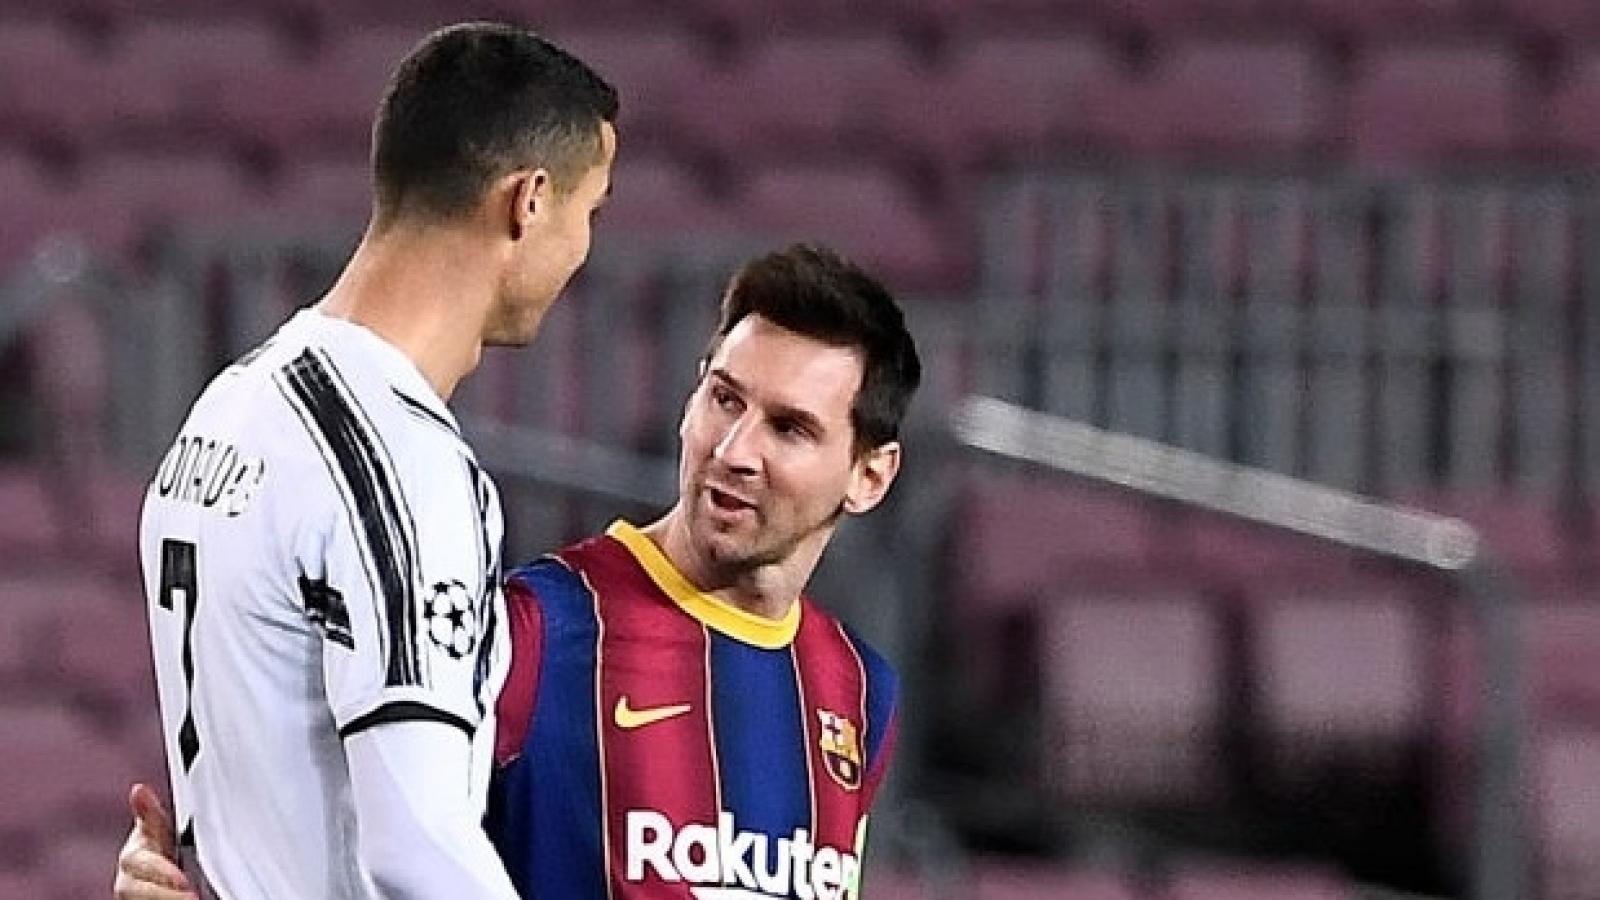 Sau tất cả, Messi thừa nhận ngưỡng mộ Ronaldo